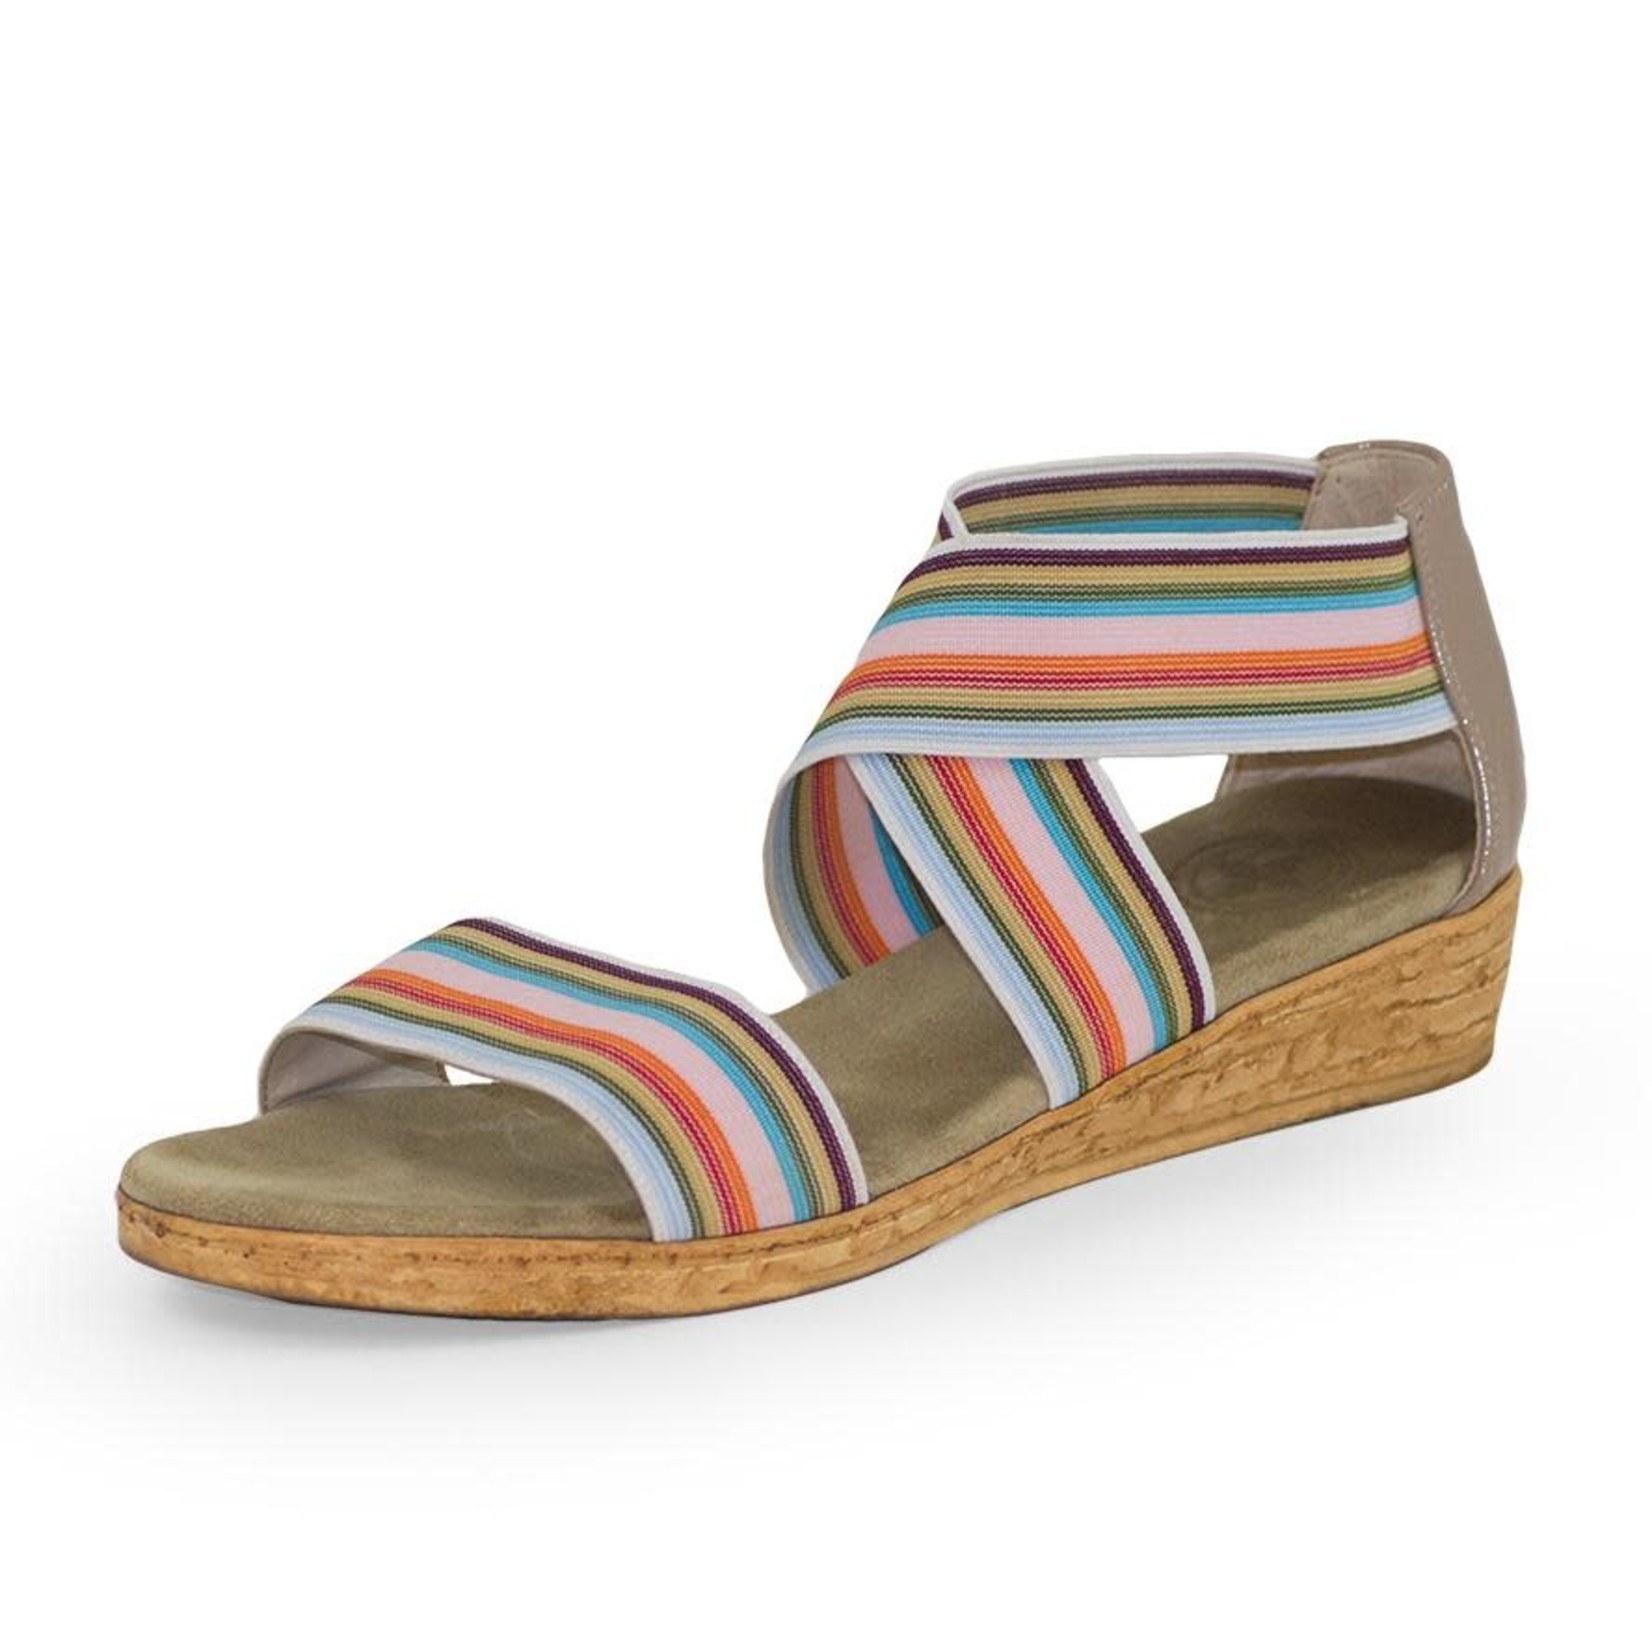 Peri Shoe in Multi Stripe 8